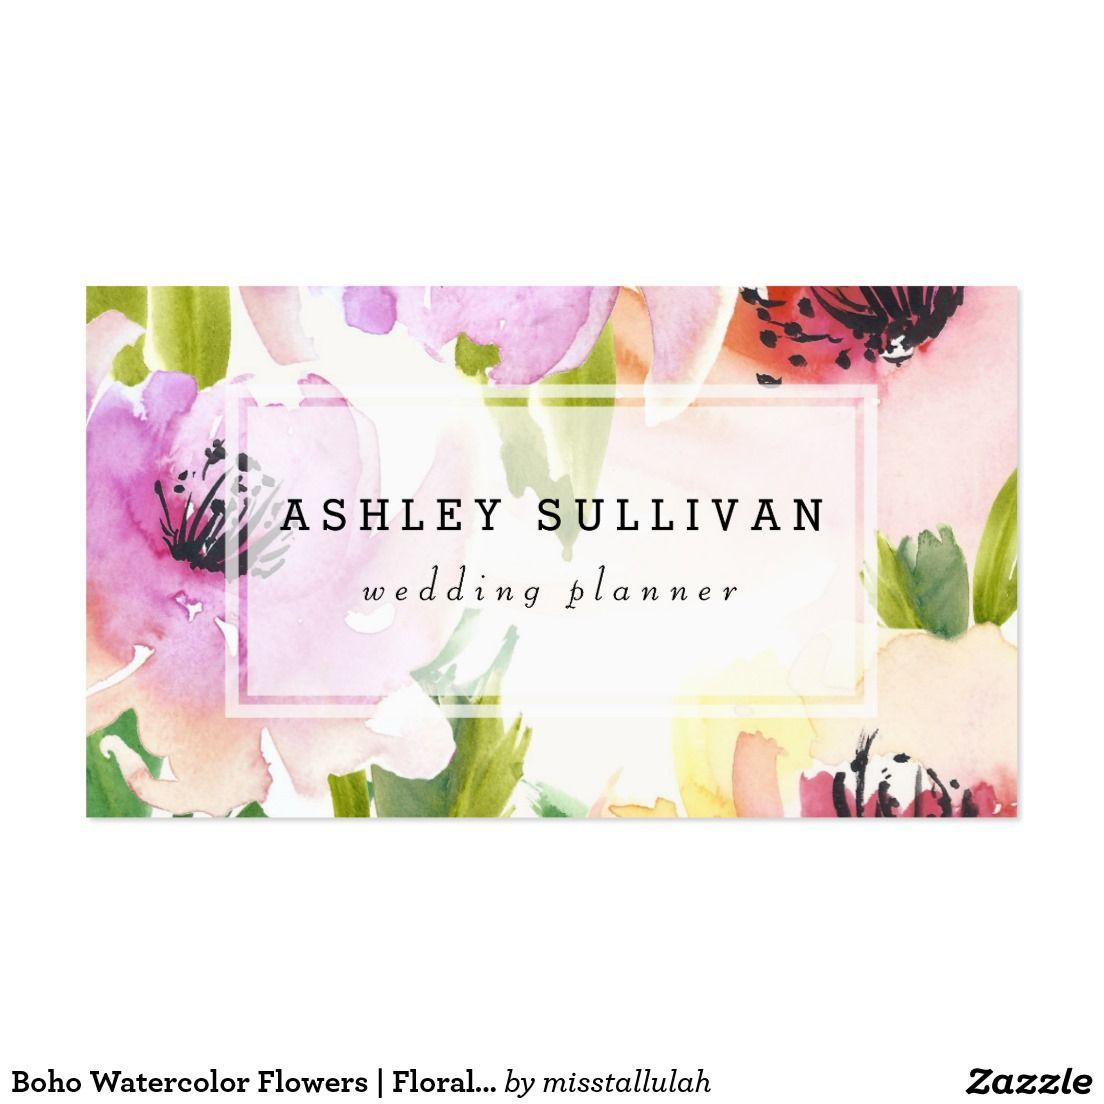 Boho Watercolor Flowers | Floral Business Card | Flowershop ...